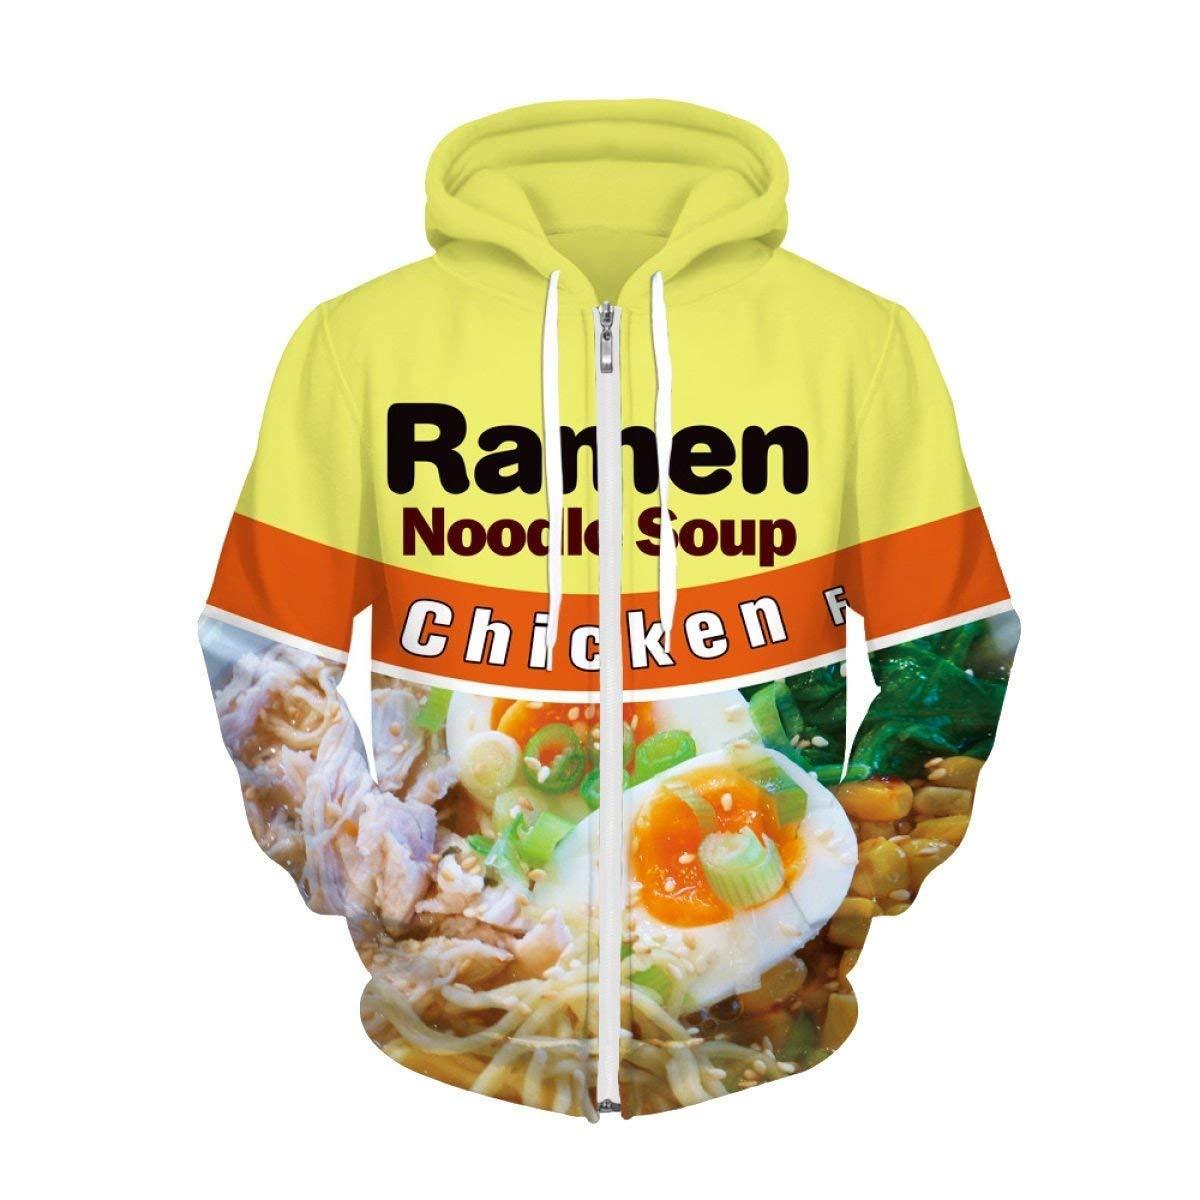 BOLAWOO Männer Nner Und Frauen Ramen Hoodies SAMT Streetstyle Kapuzenpulli Plus Pullover Mode Marken Pullover Baseball Kleidung